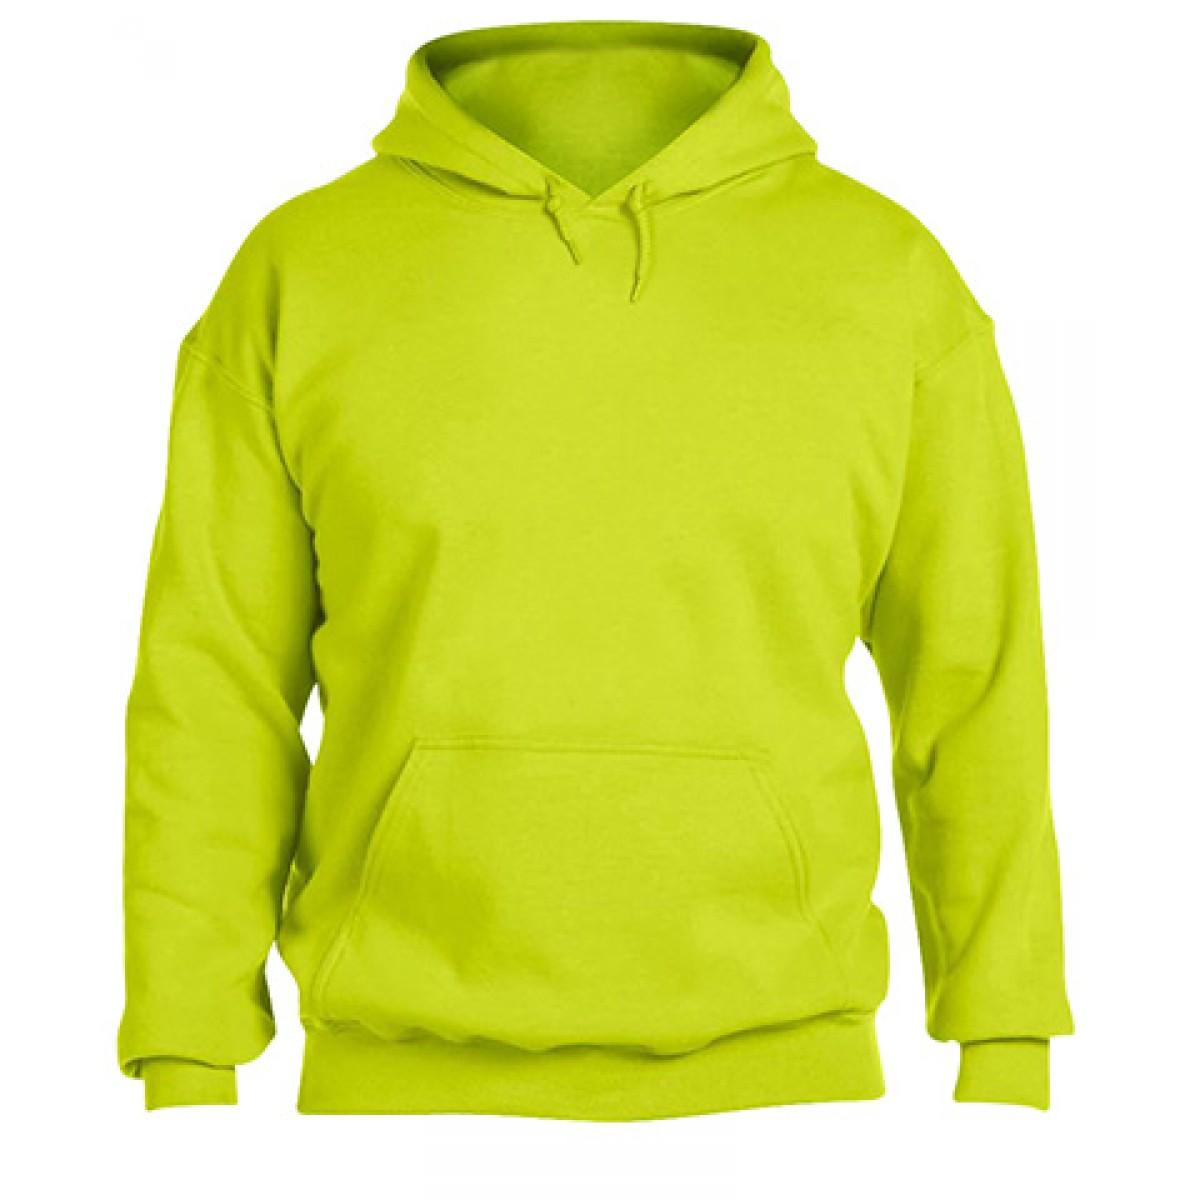 Hooded Sweatshirt 50/50 Heavy Blend-Safety Green-YM